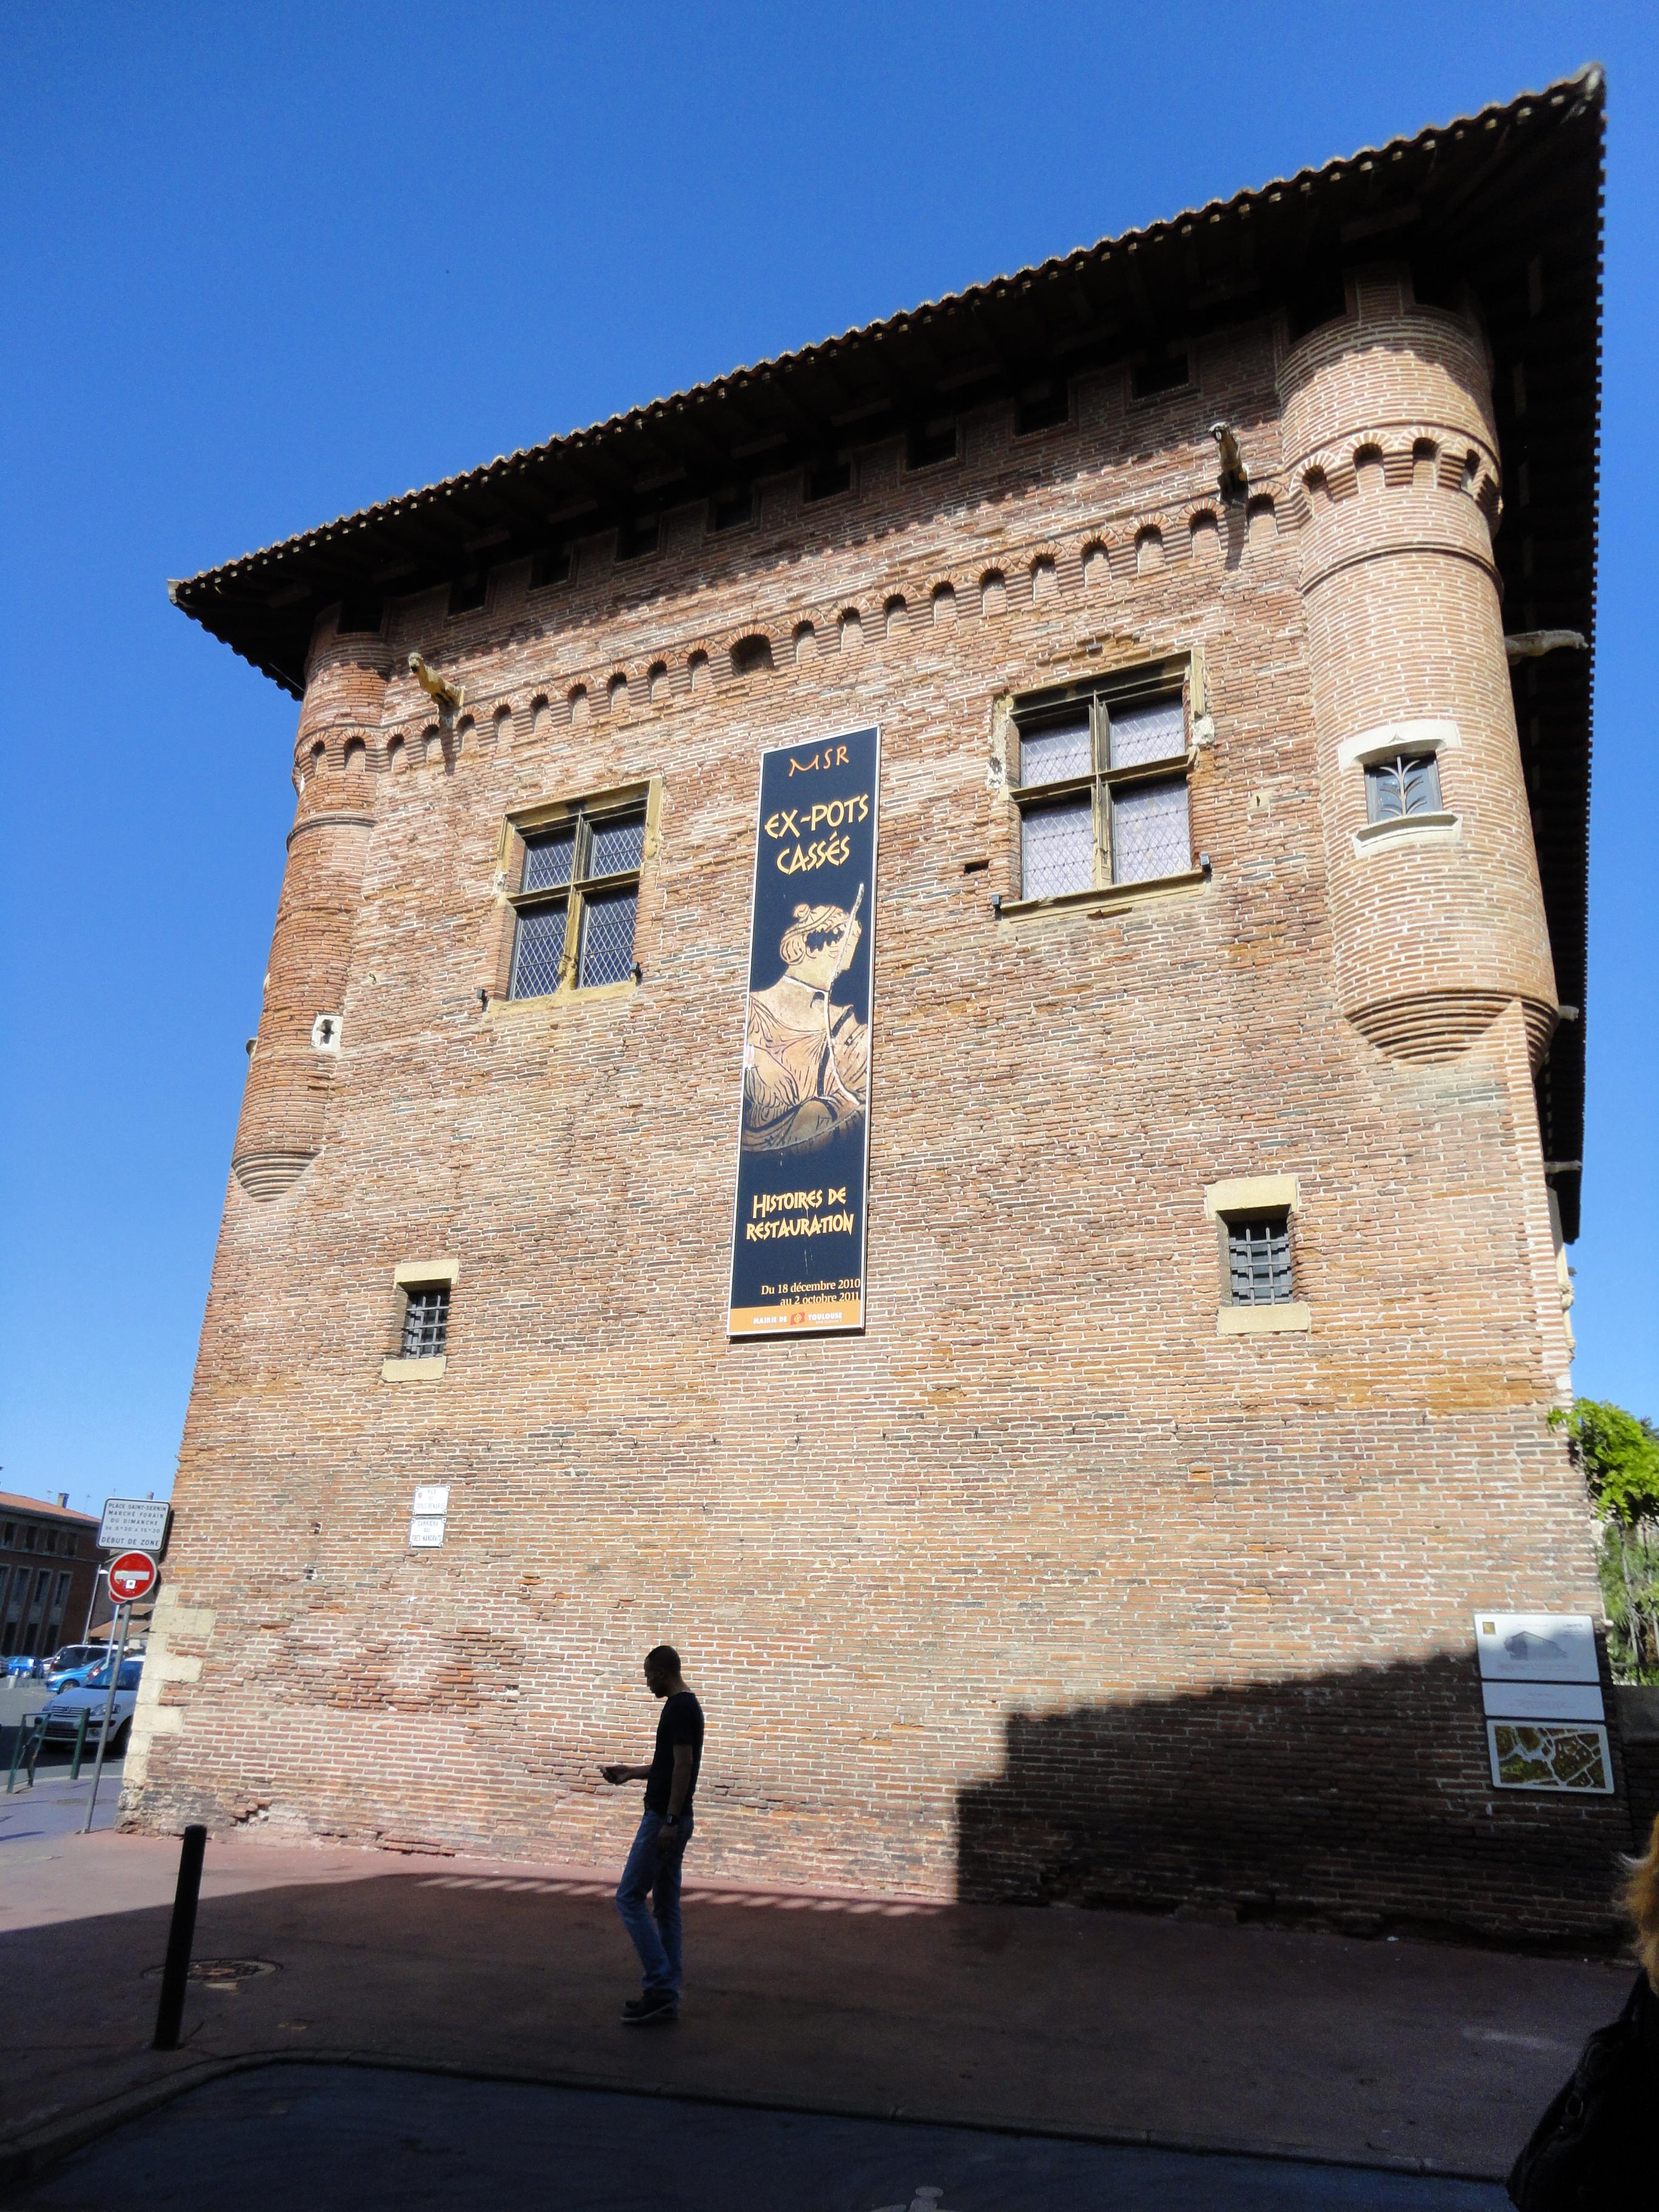 Toulouse - Musée Saint-Raymond